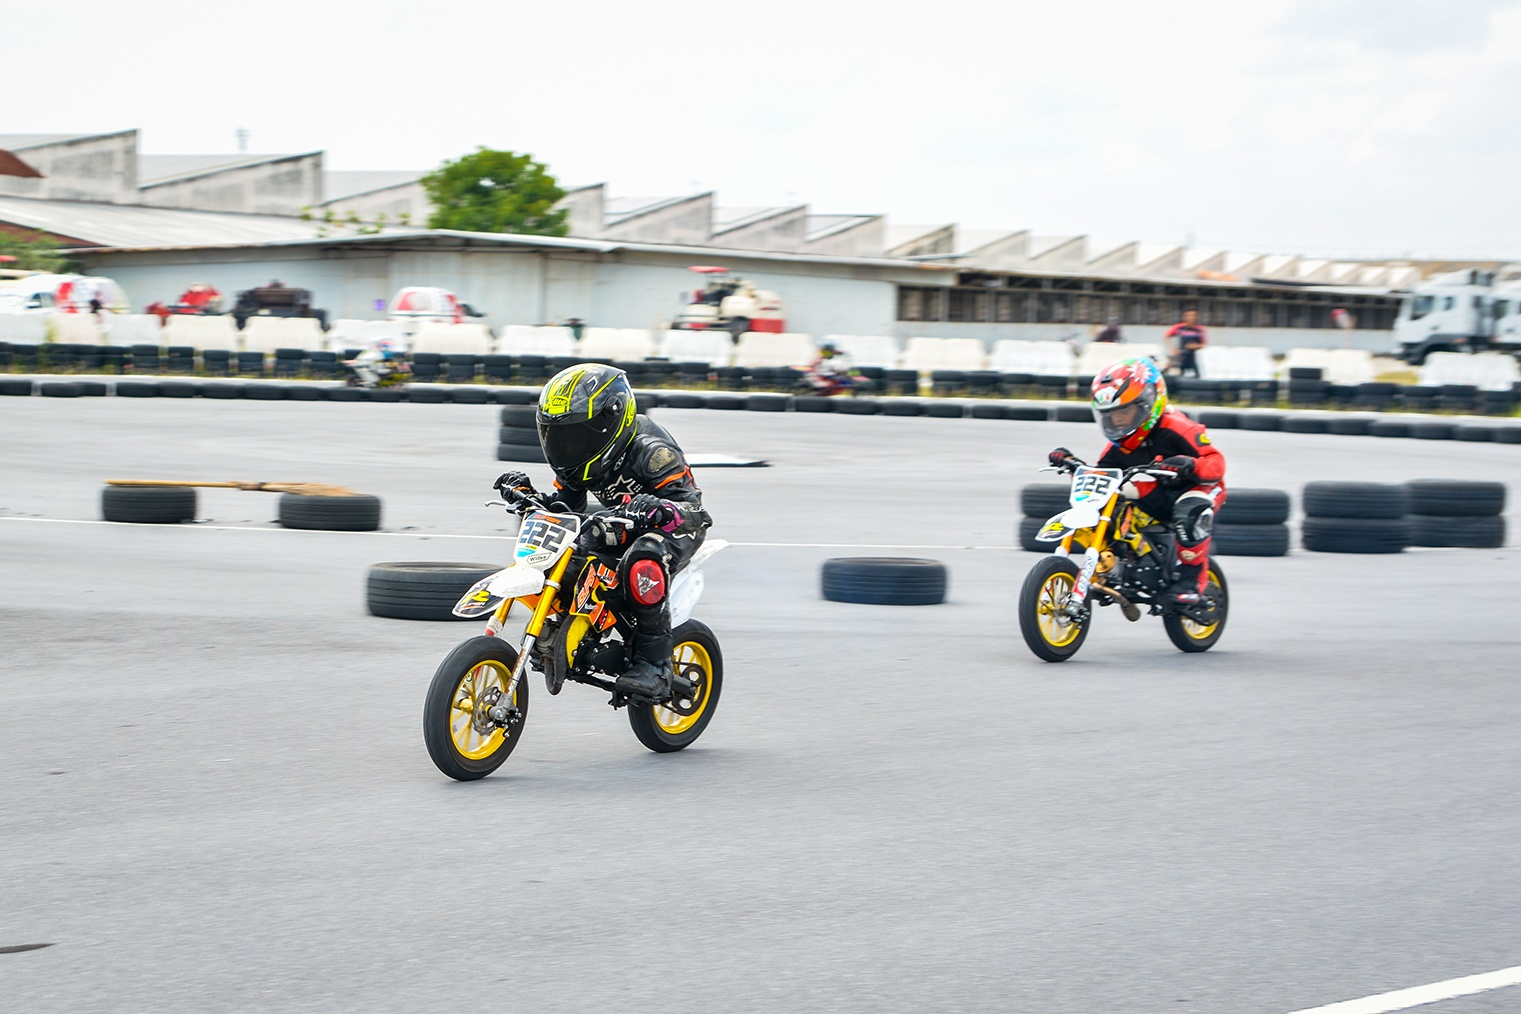 Giai dua moto tre em o Thai Lan va nhung giac mo MotoGP hinh anh 36